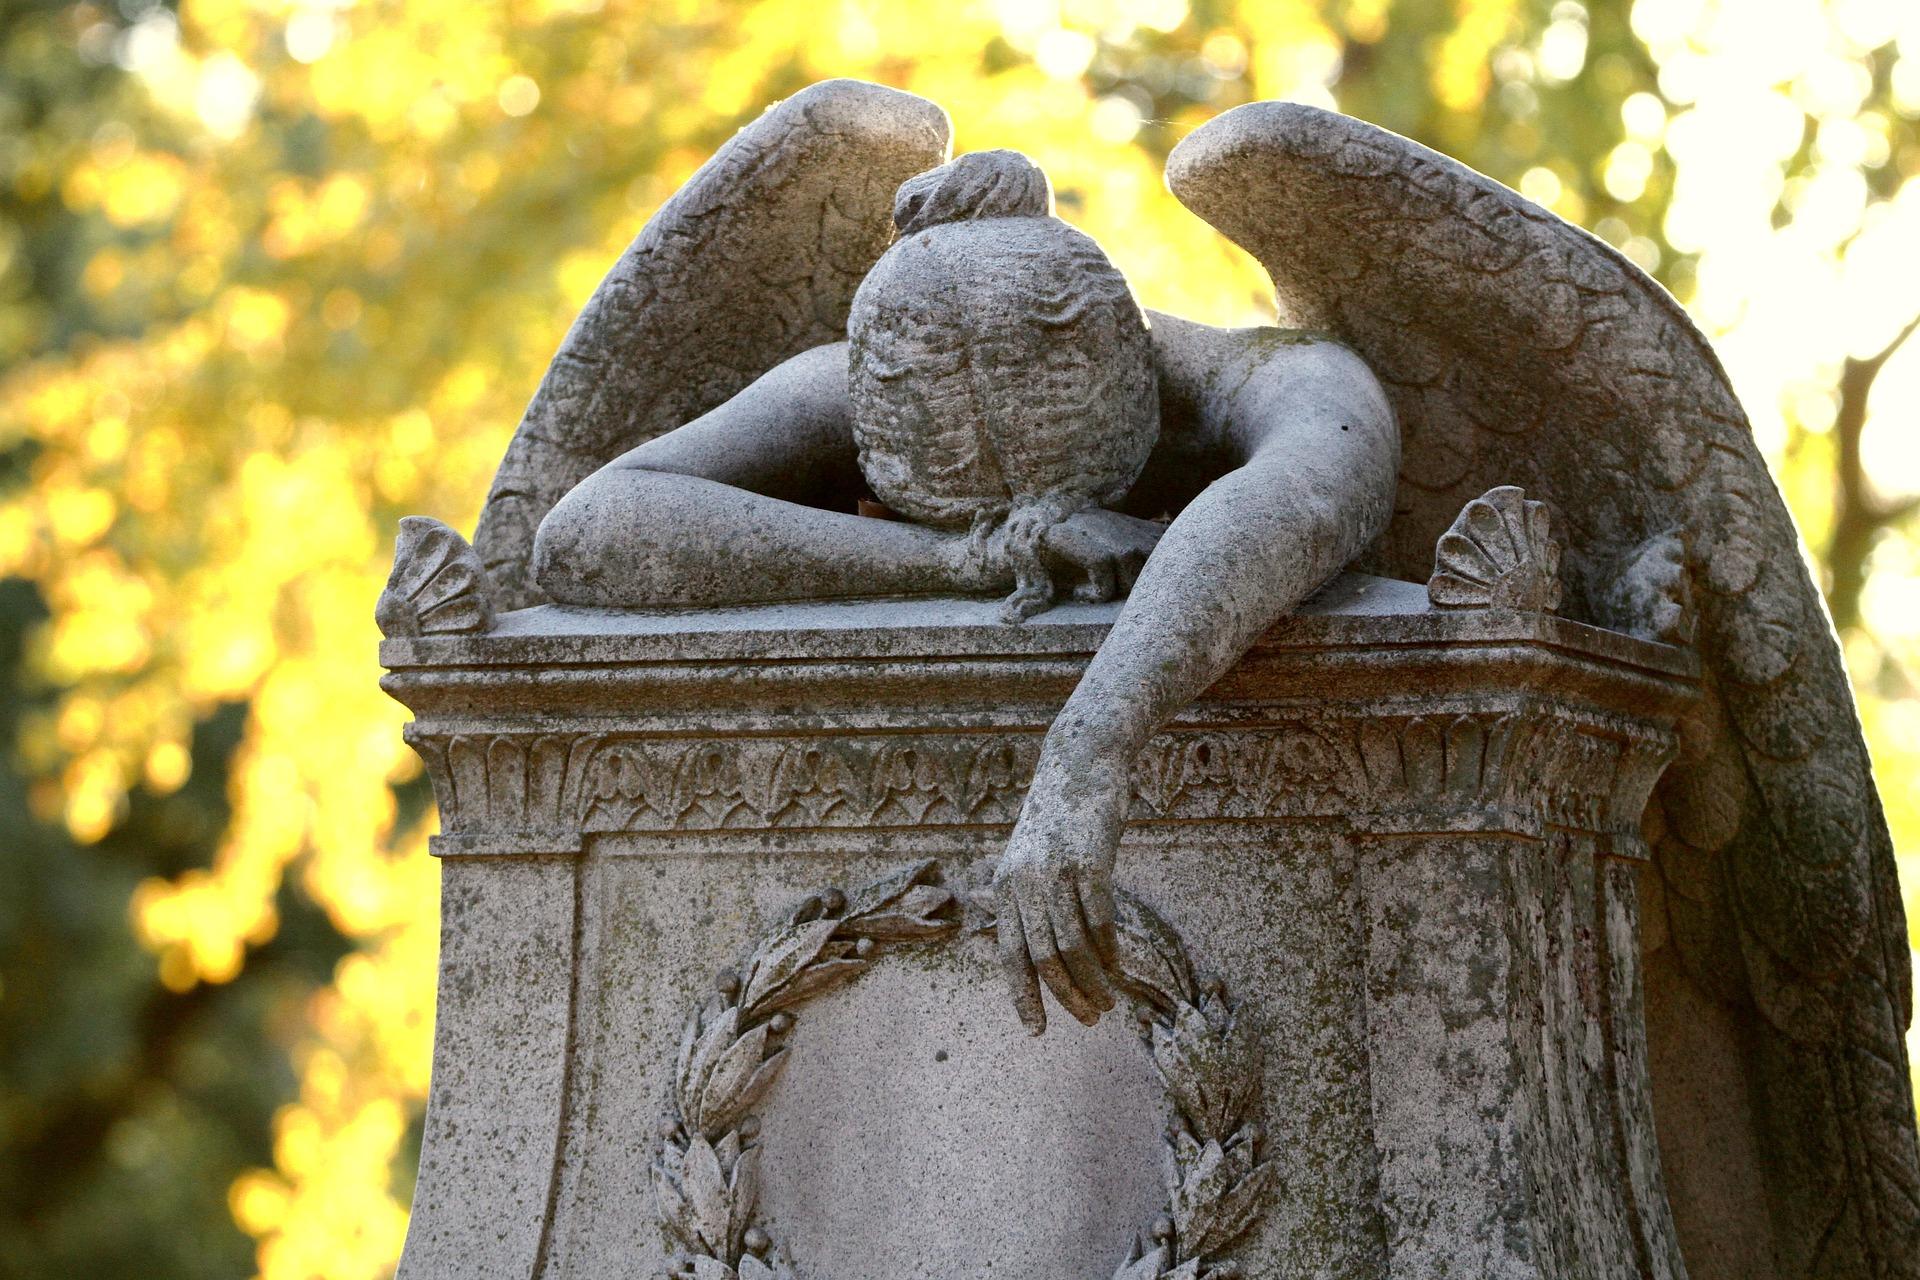 angel-1822368_1920.jpg